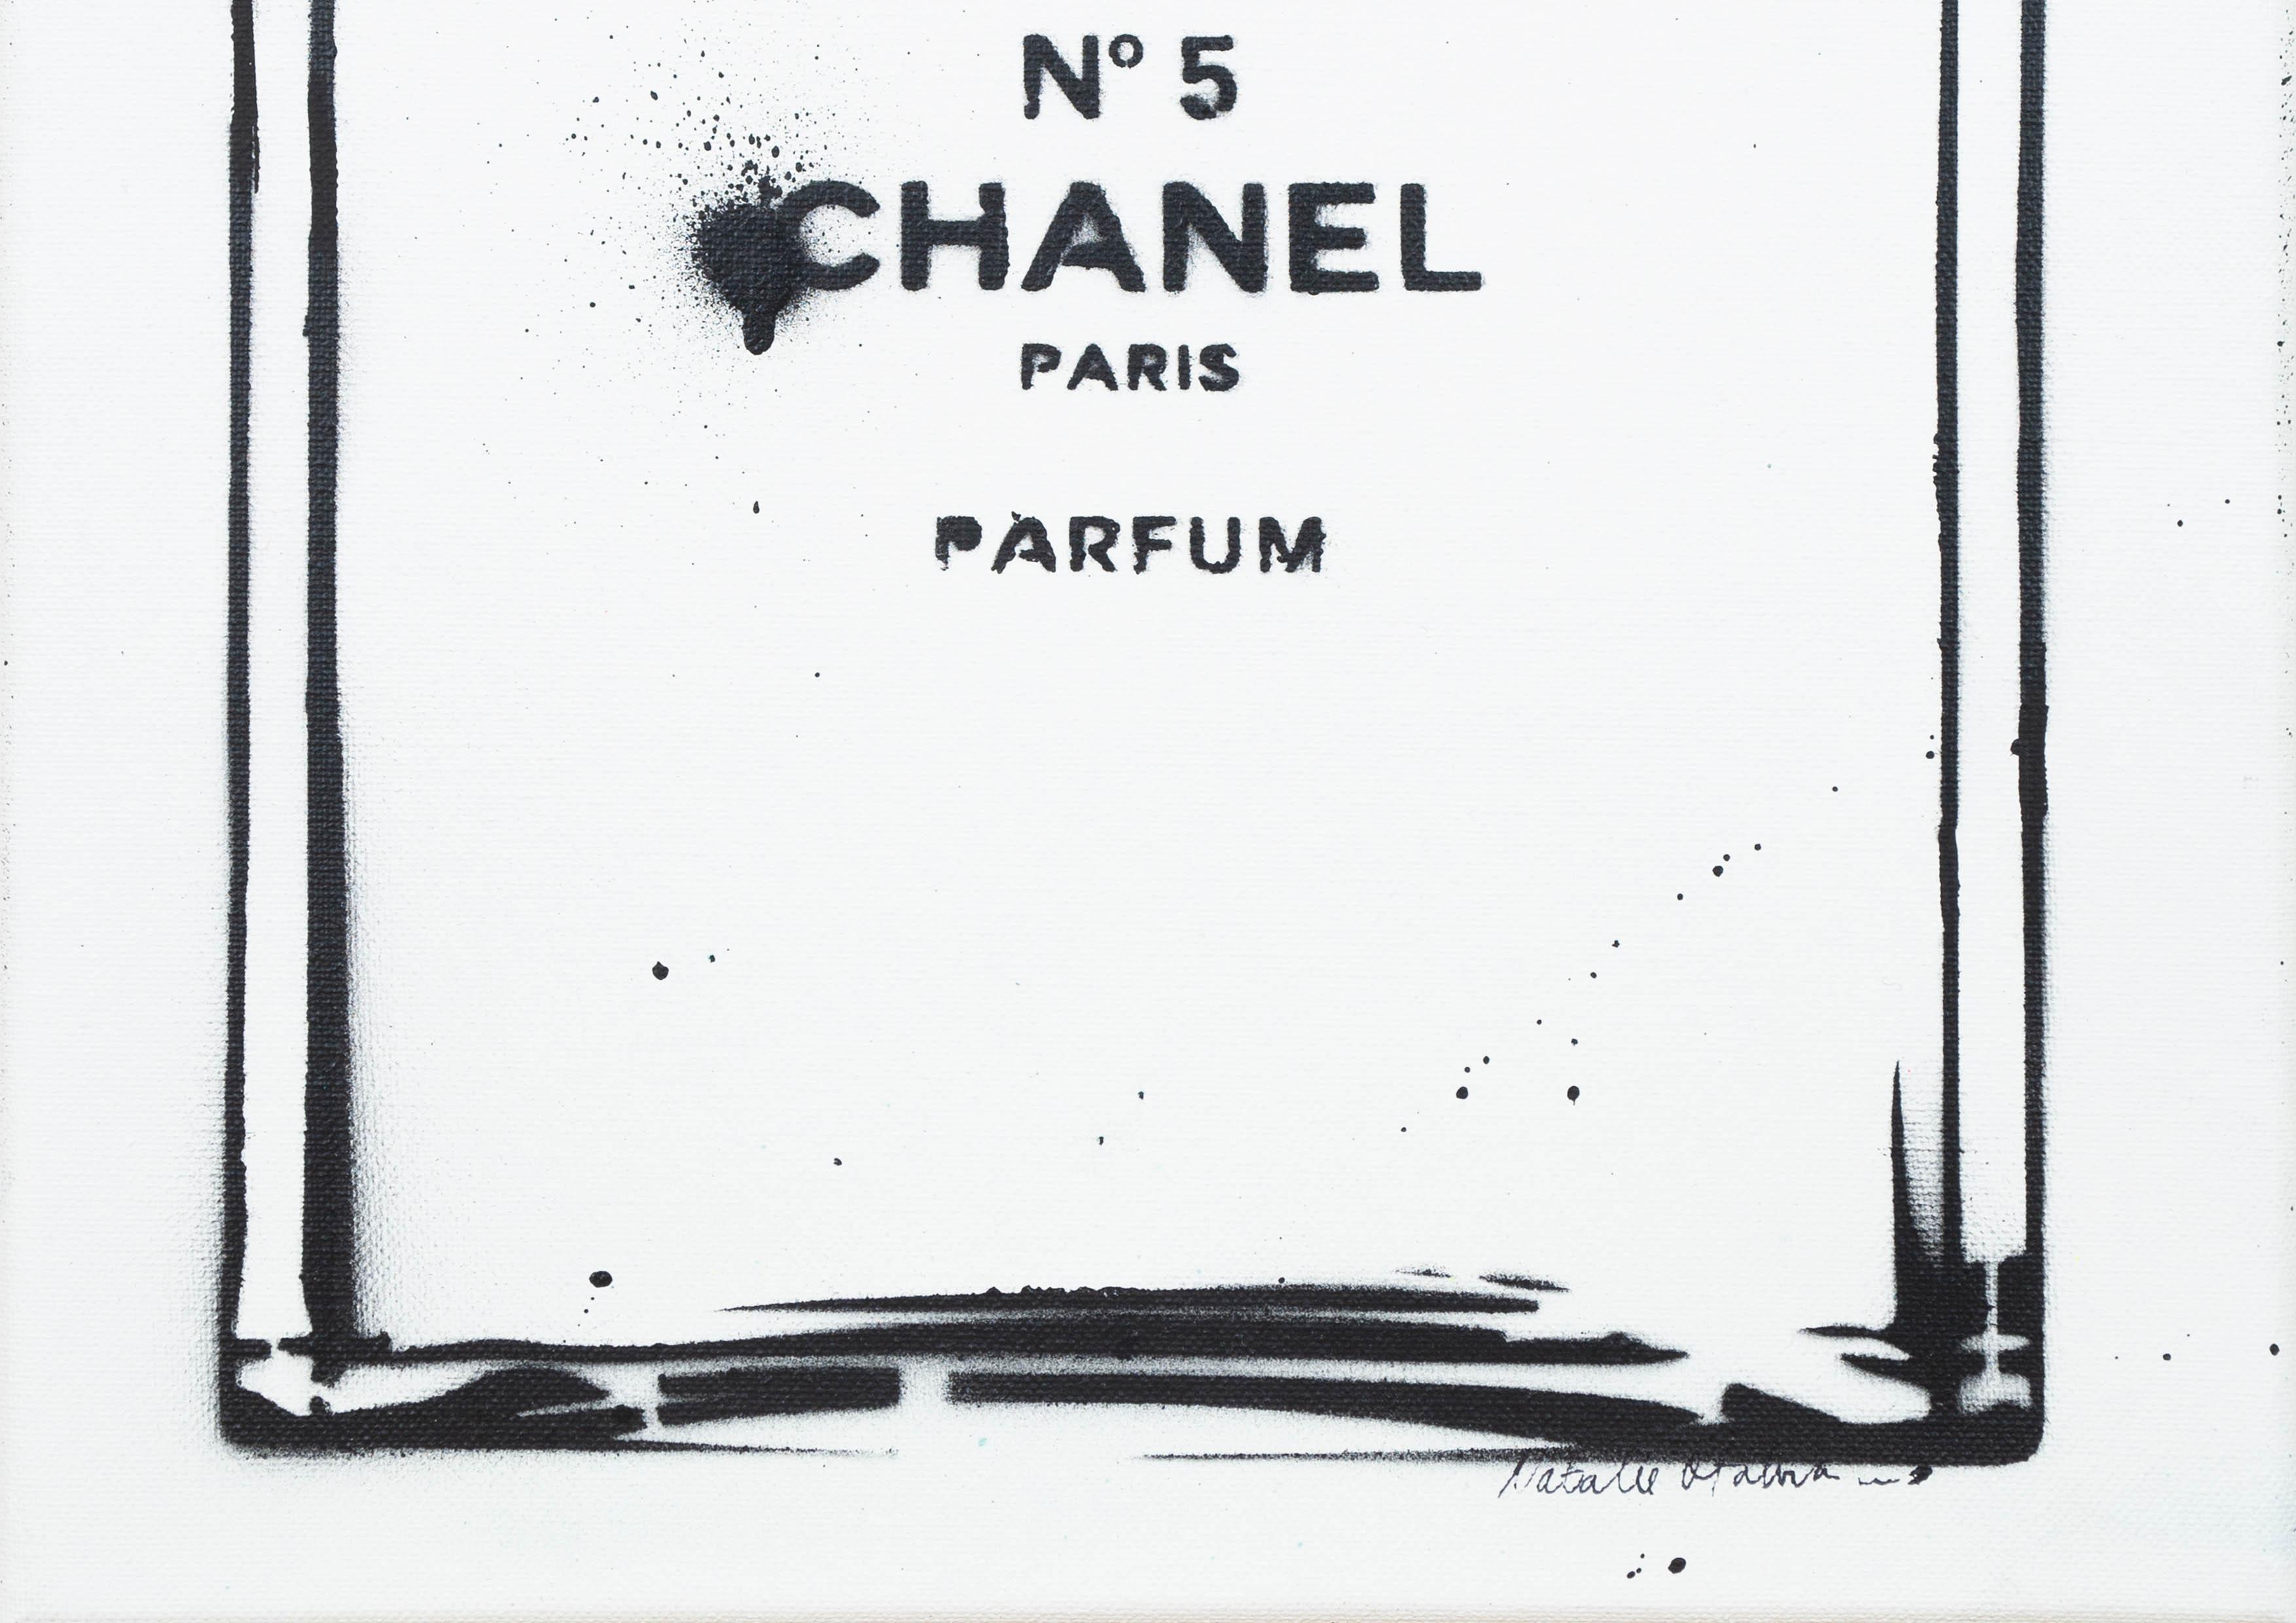 ART-PAINT-CHANEL-PERFUME-JUST-BLACK-CANVAS-DETAIL